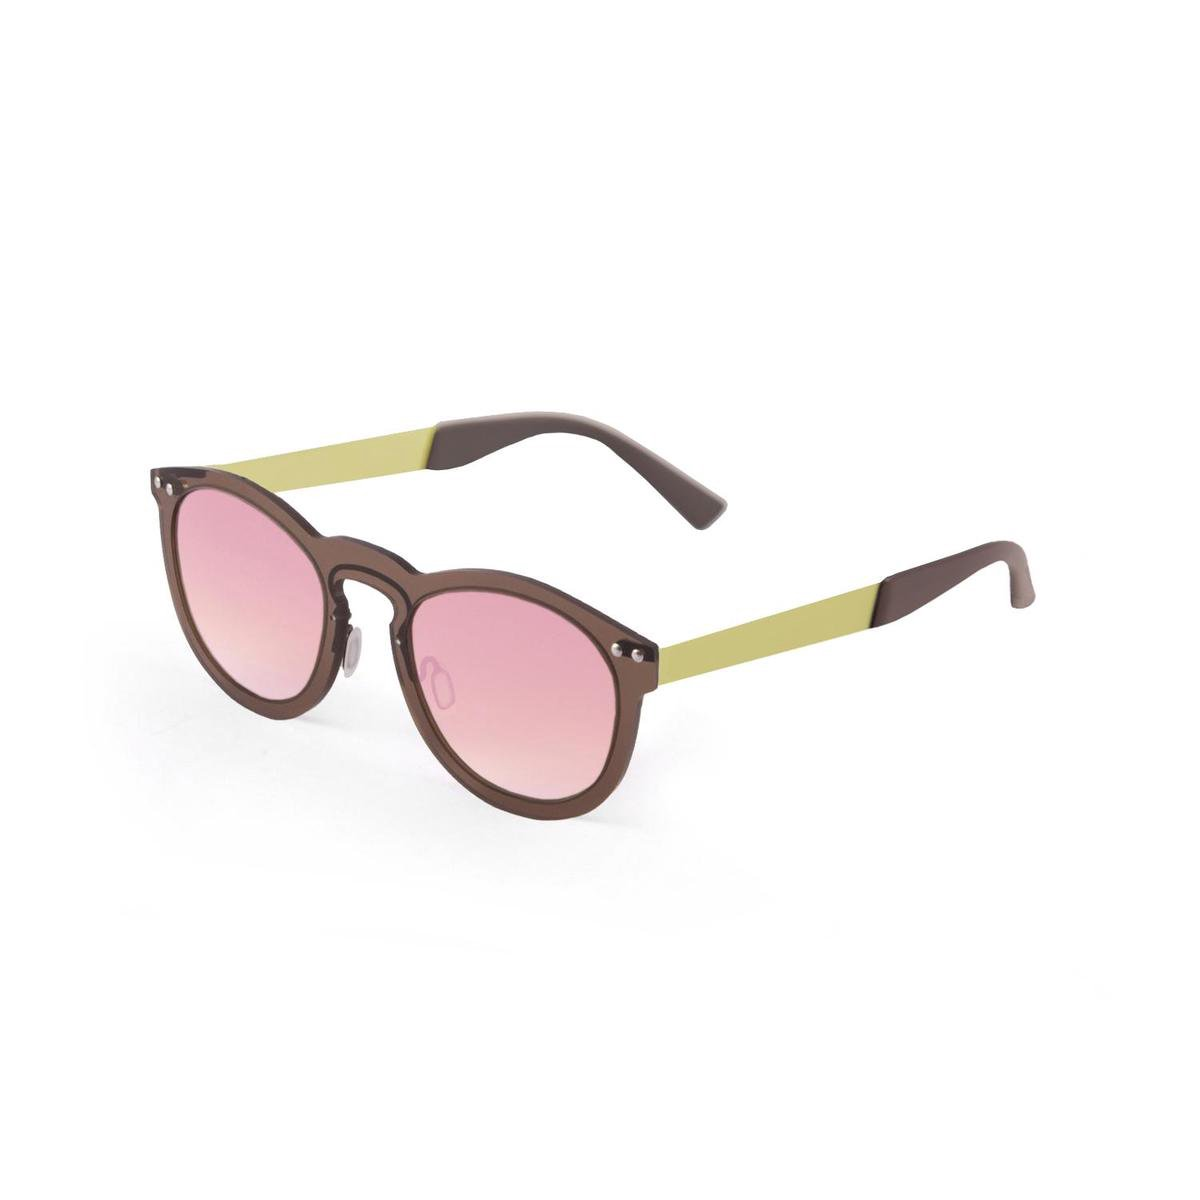 Ocean Sunglasses - Zonnebril - Unisex - 21.26_IBIZA_PINK-BROWN - Ocean Sunglasses